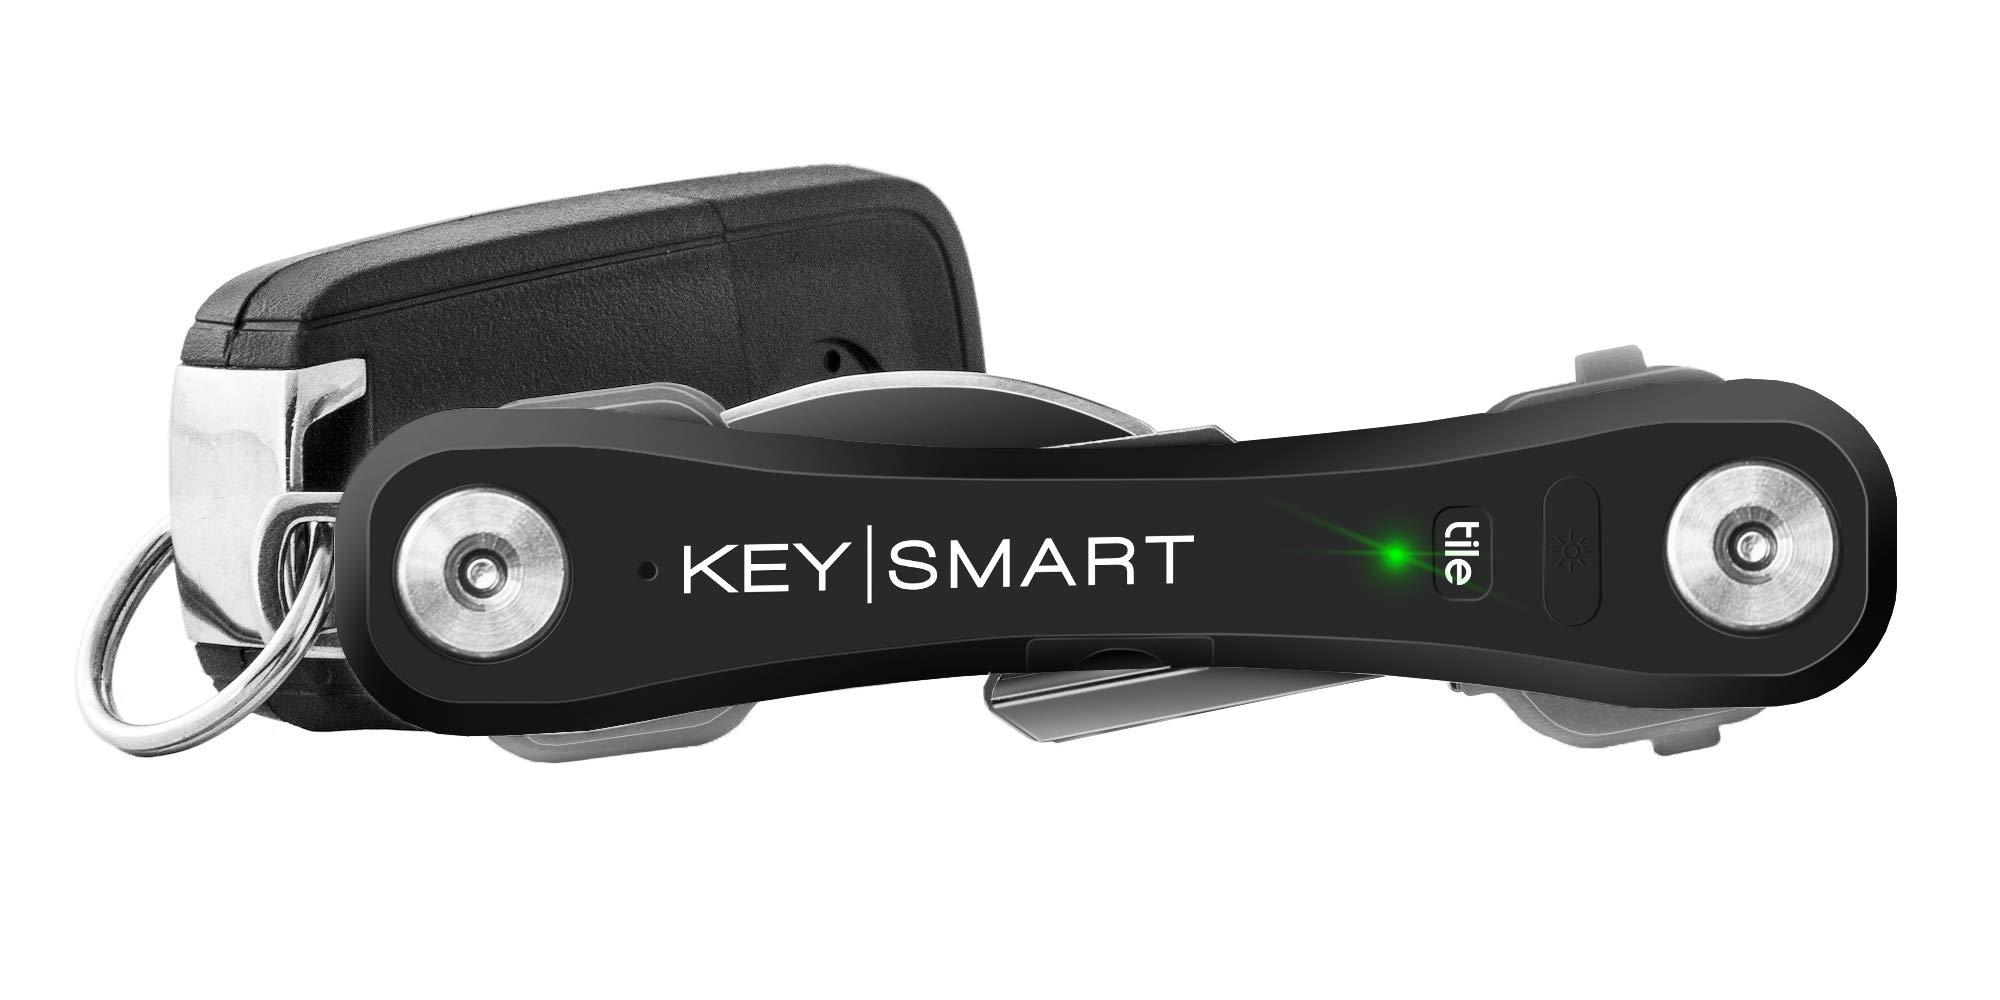 KeySmart Pro - Compact Key Holder w LED Light & Tile Smart Technology, Track your Lost Keys & Phone w Bluetooth (up to 10 Keys, Black)